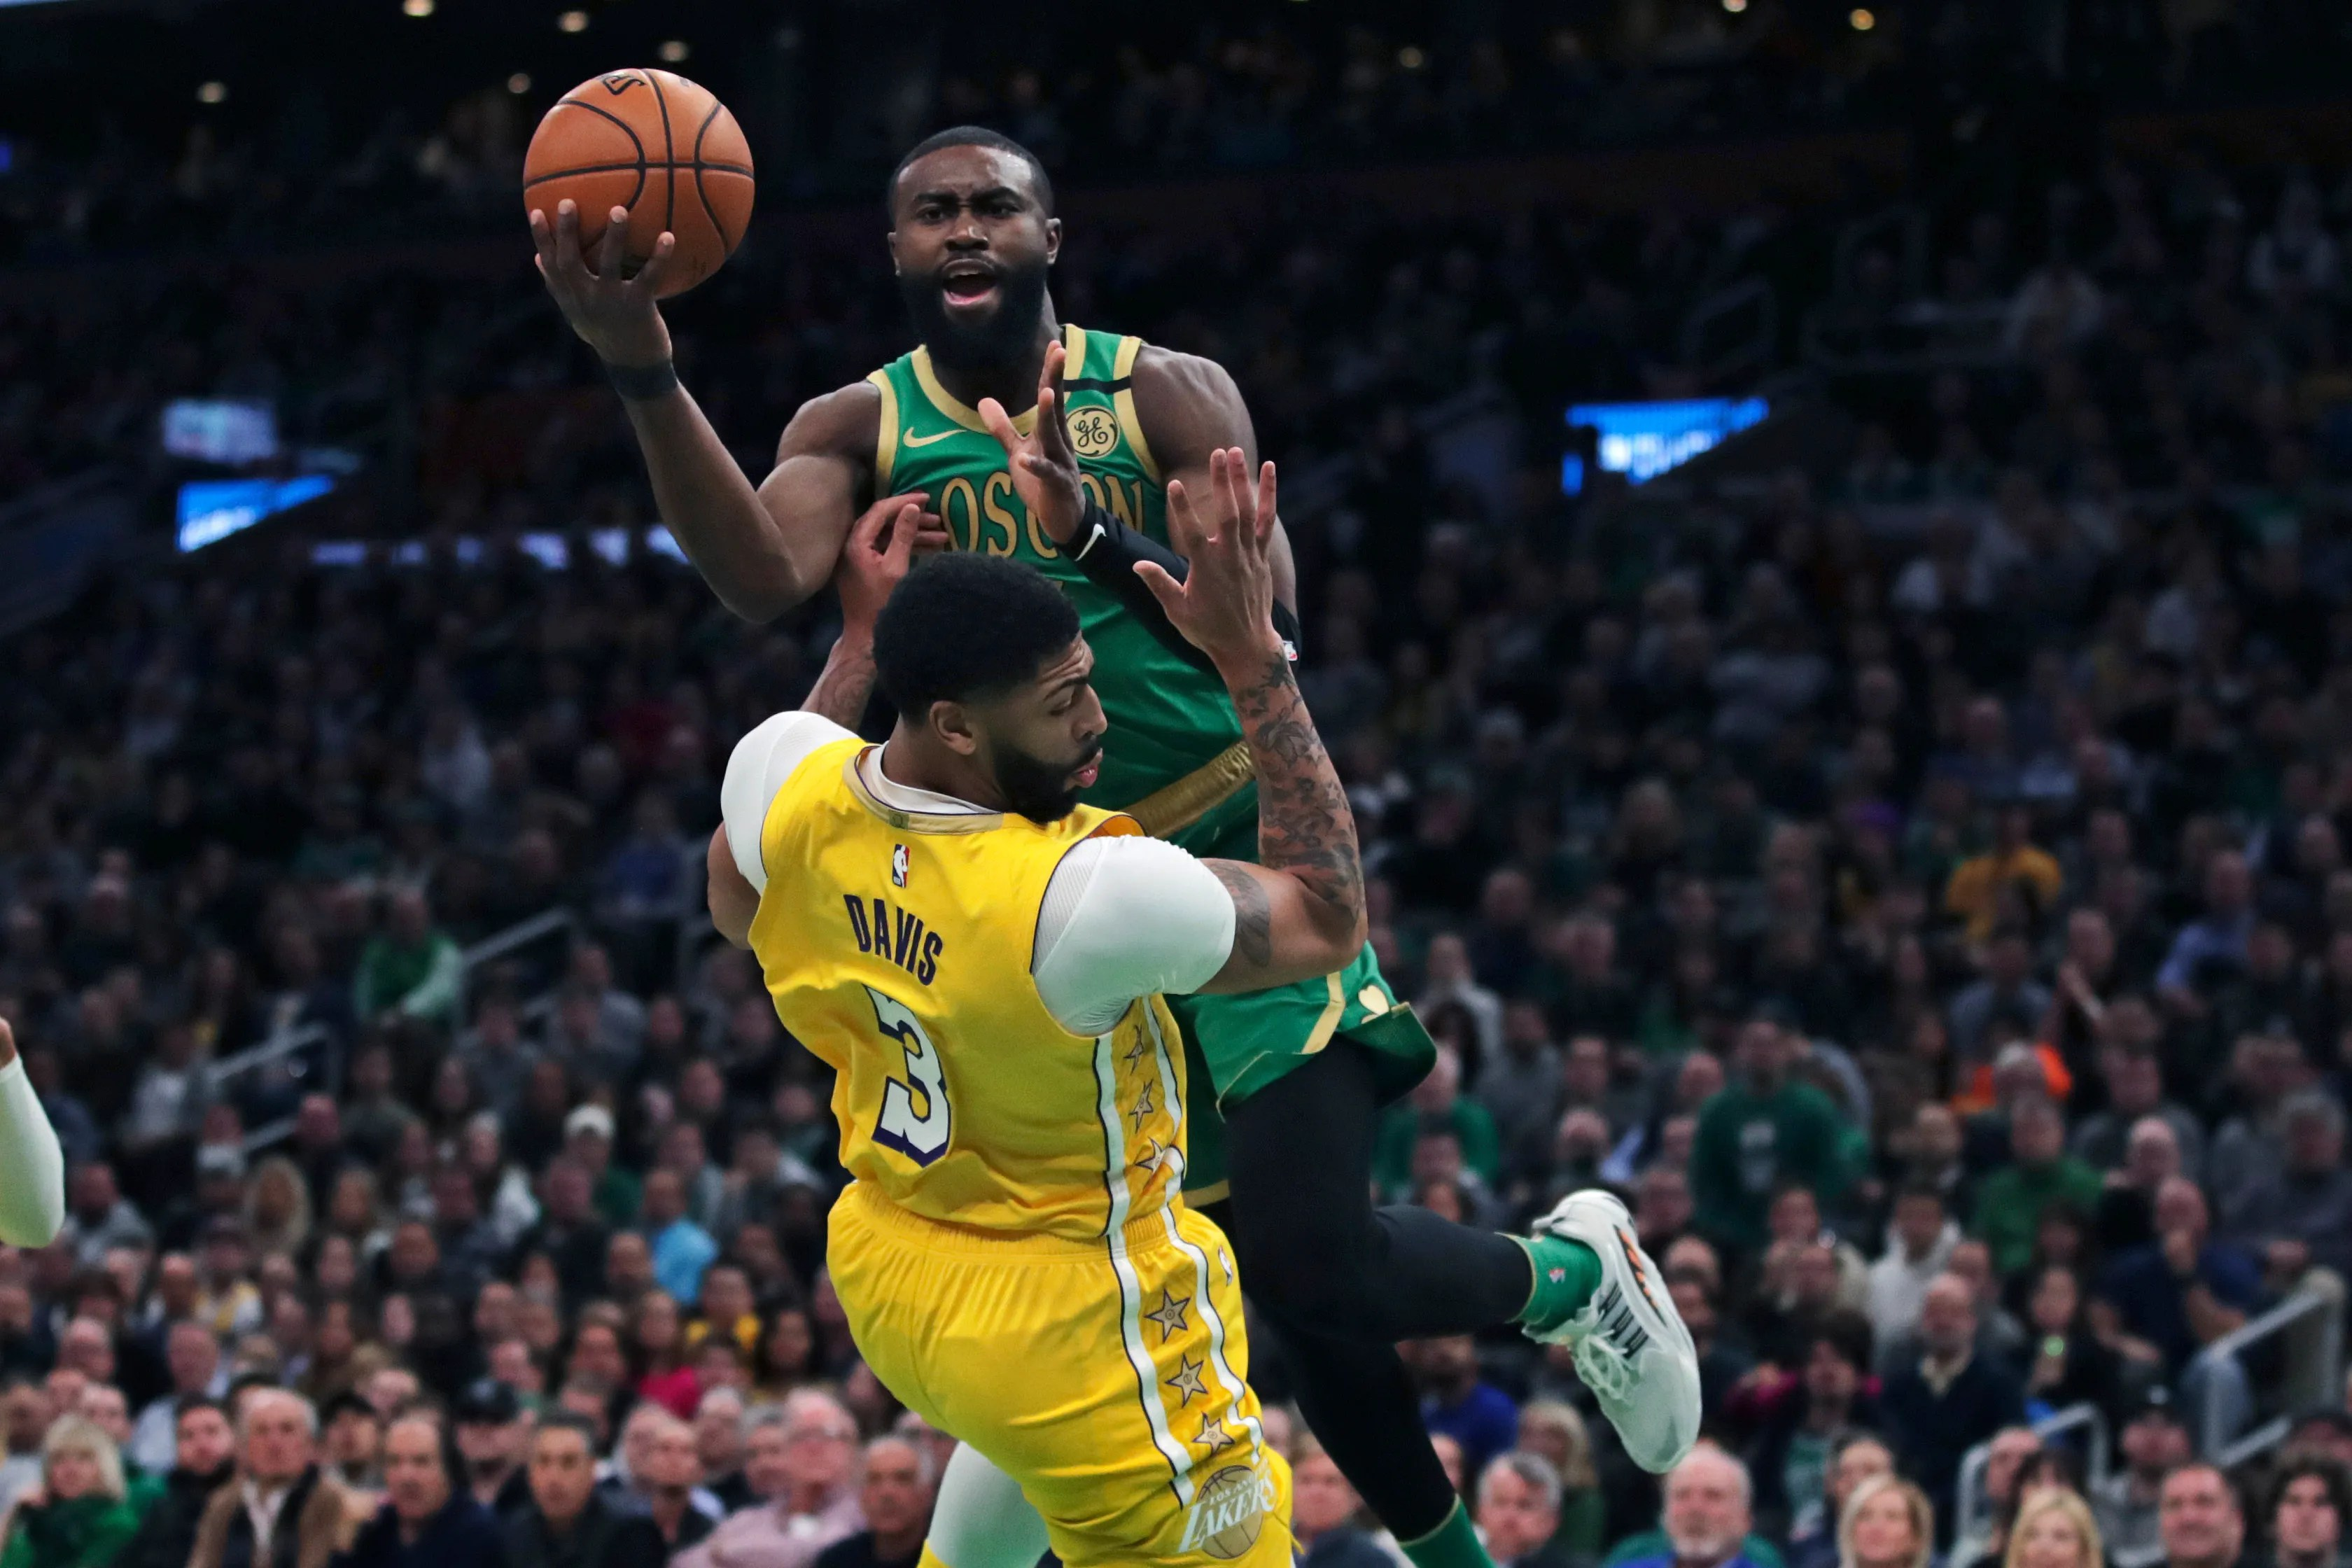 Celtics Snap Losing Streak With Dominant Win Vs Lakers